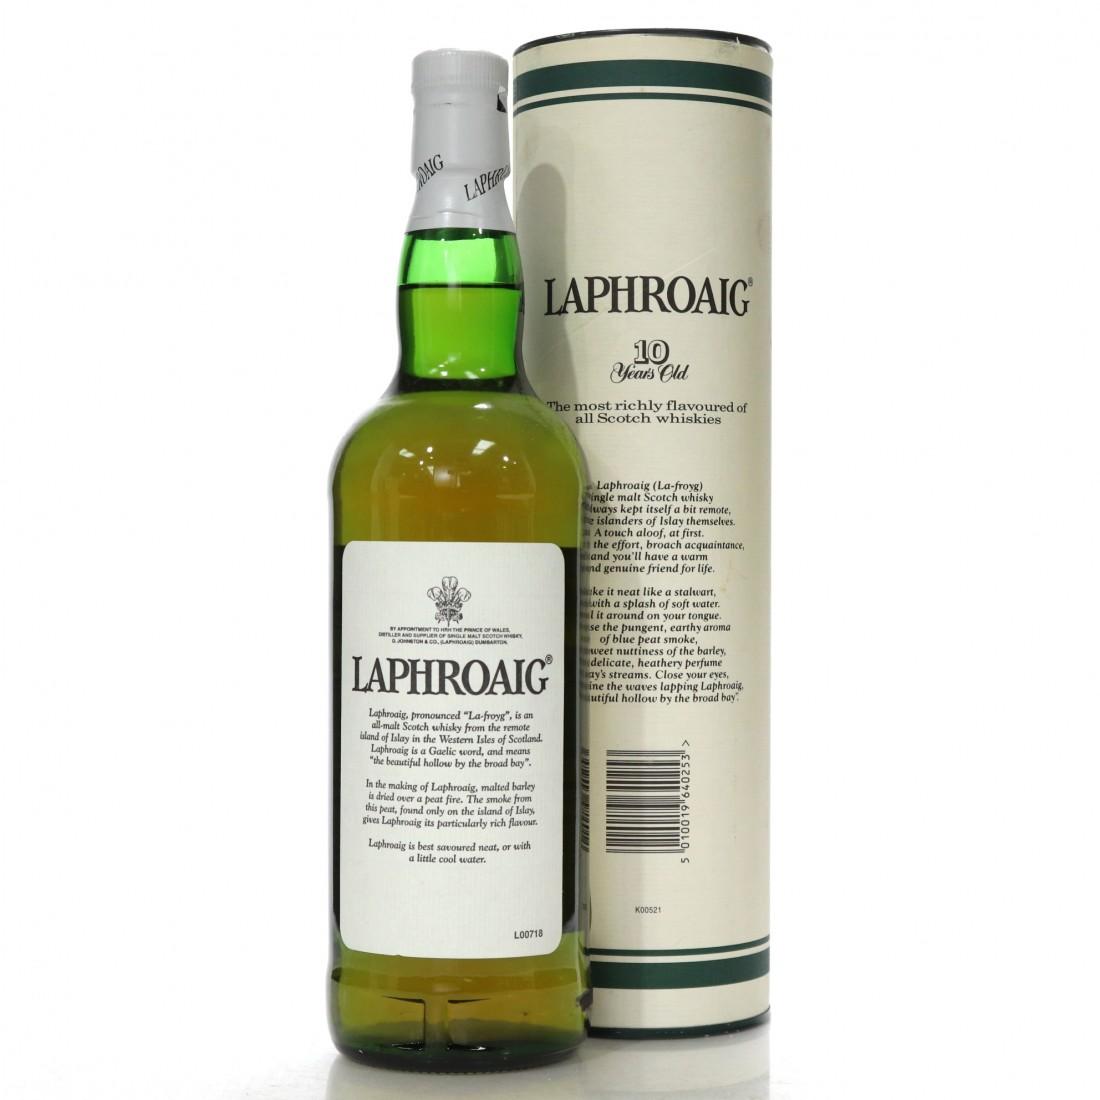 Laphroaig 10 Year Old 75cl